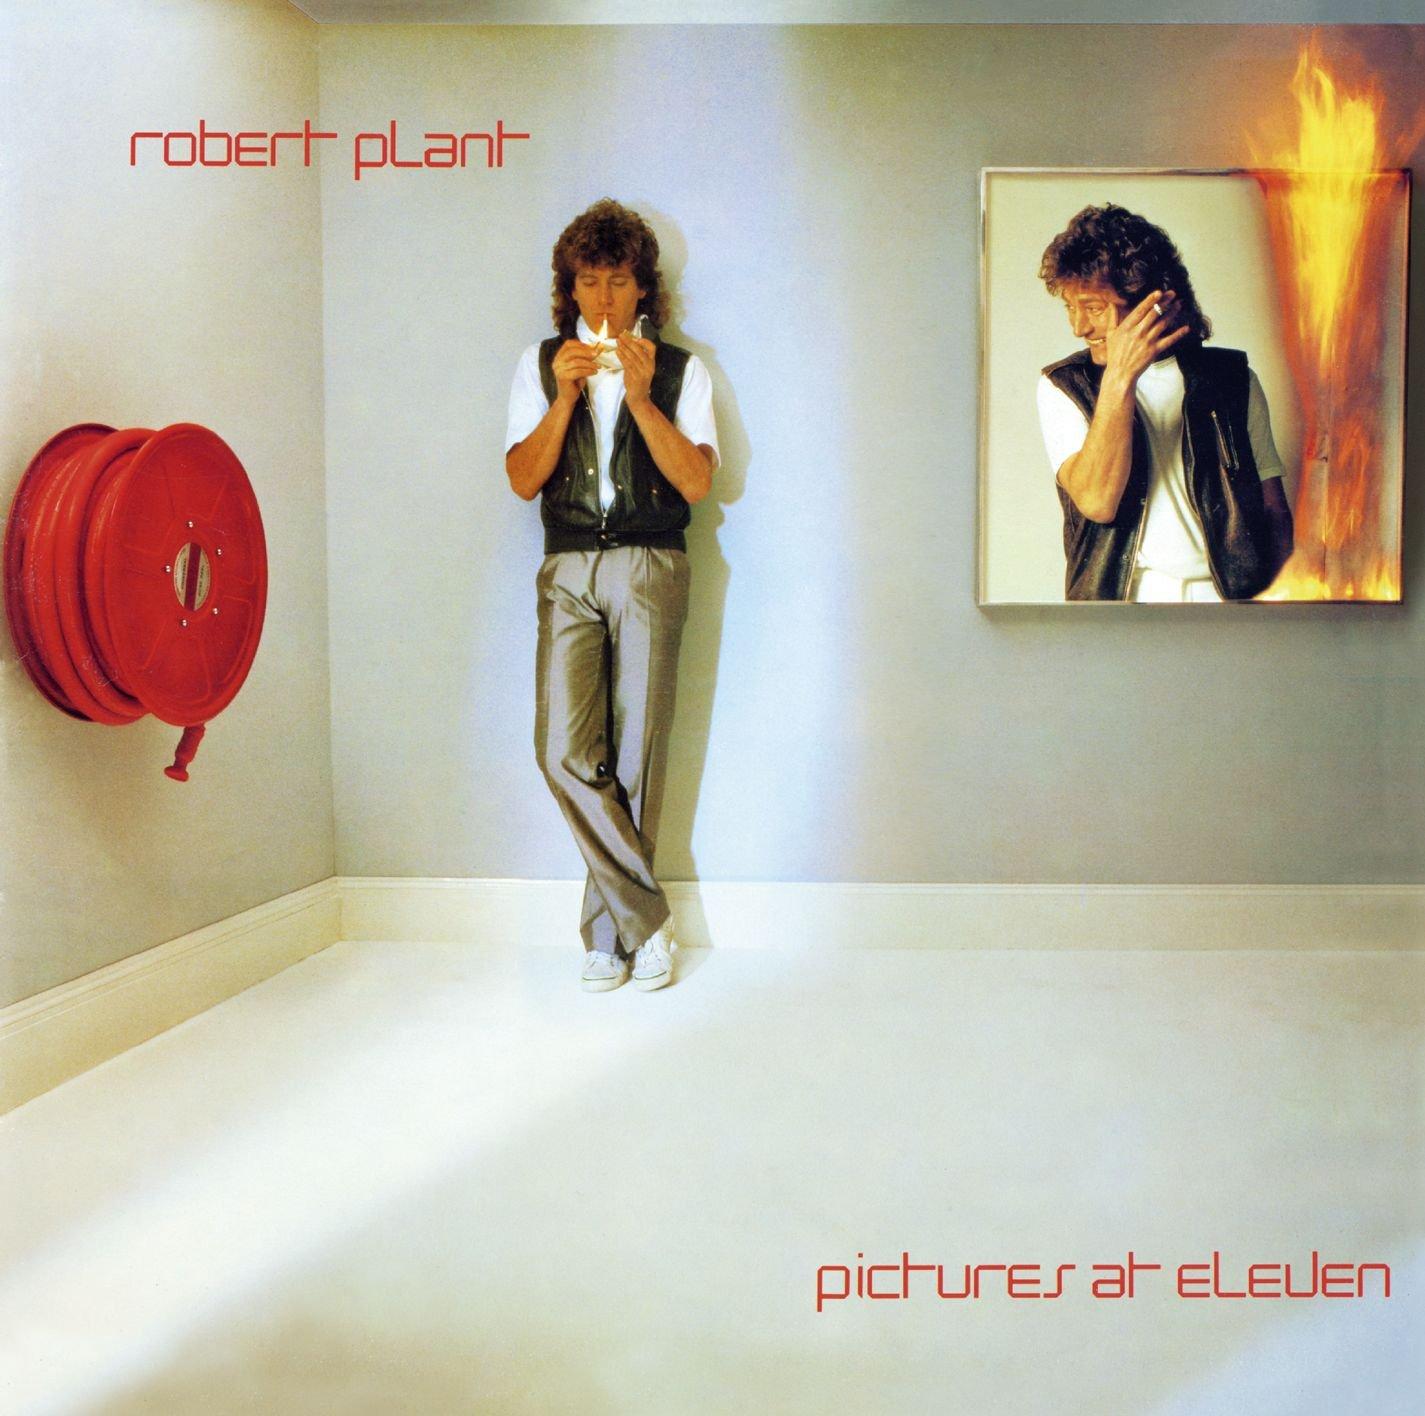 CD : Robert Plant - Pictures at Eleven (Bonus Tracks, Remastered)